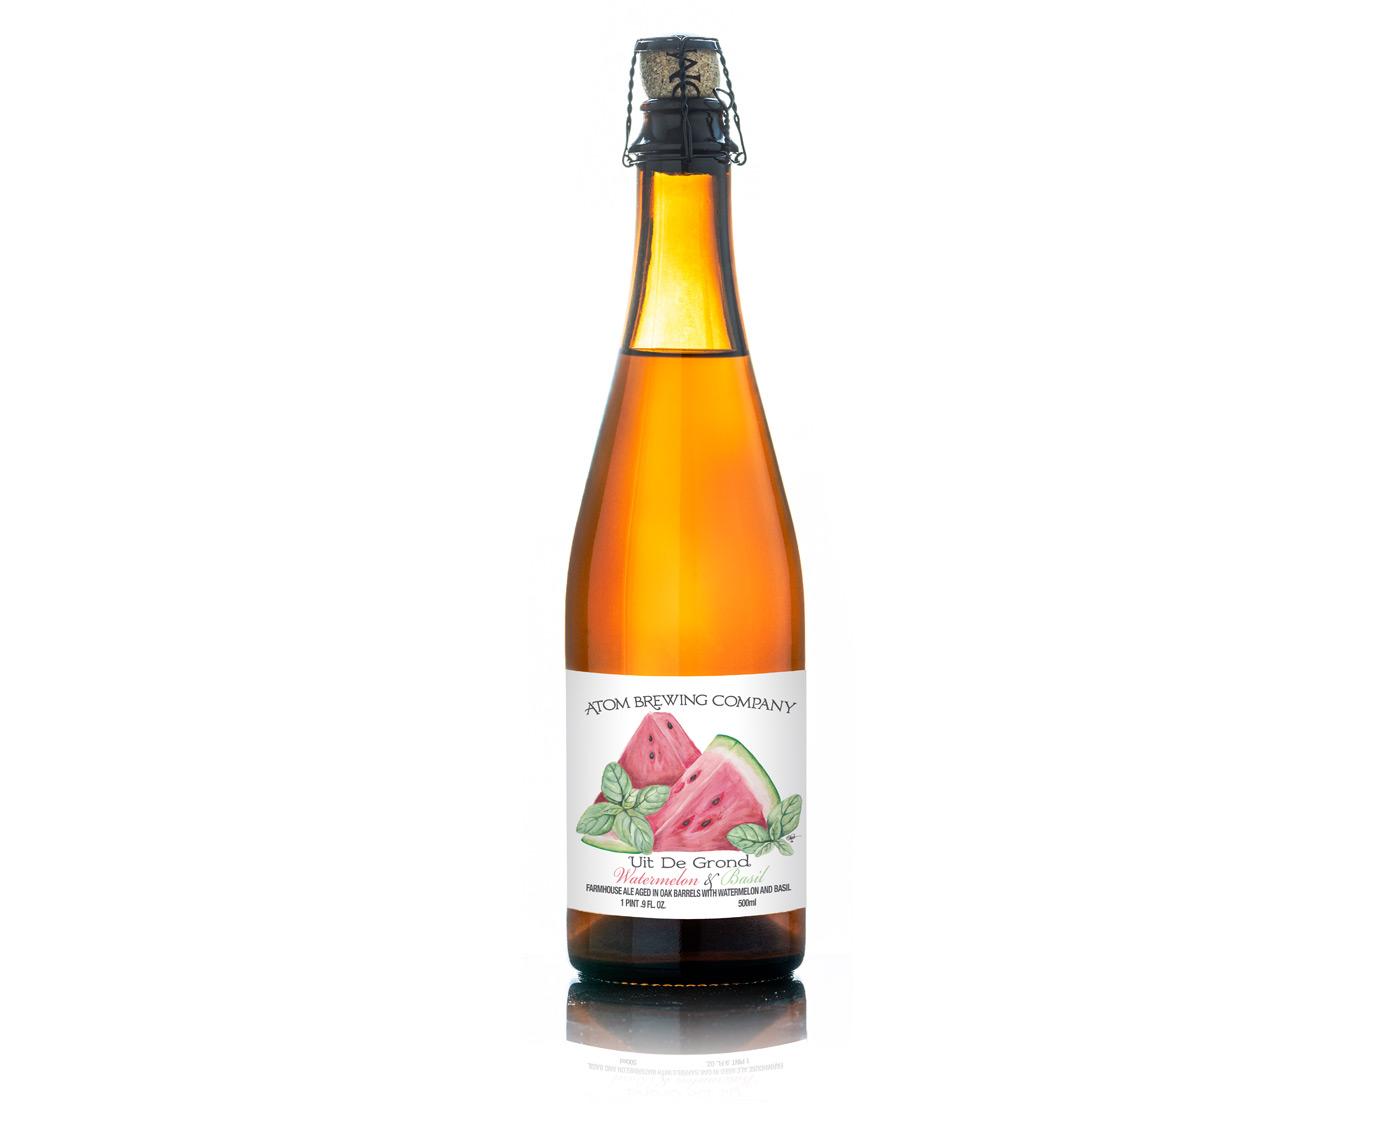 "Watermelon <span class=""amp"">&</span> Basil Uit De Grond"